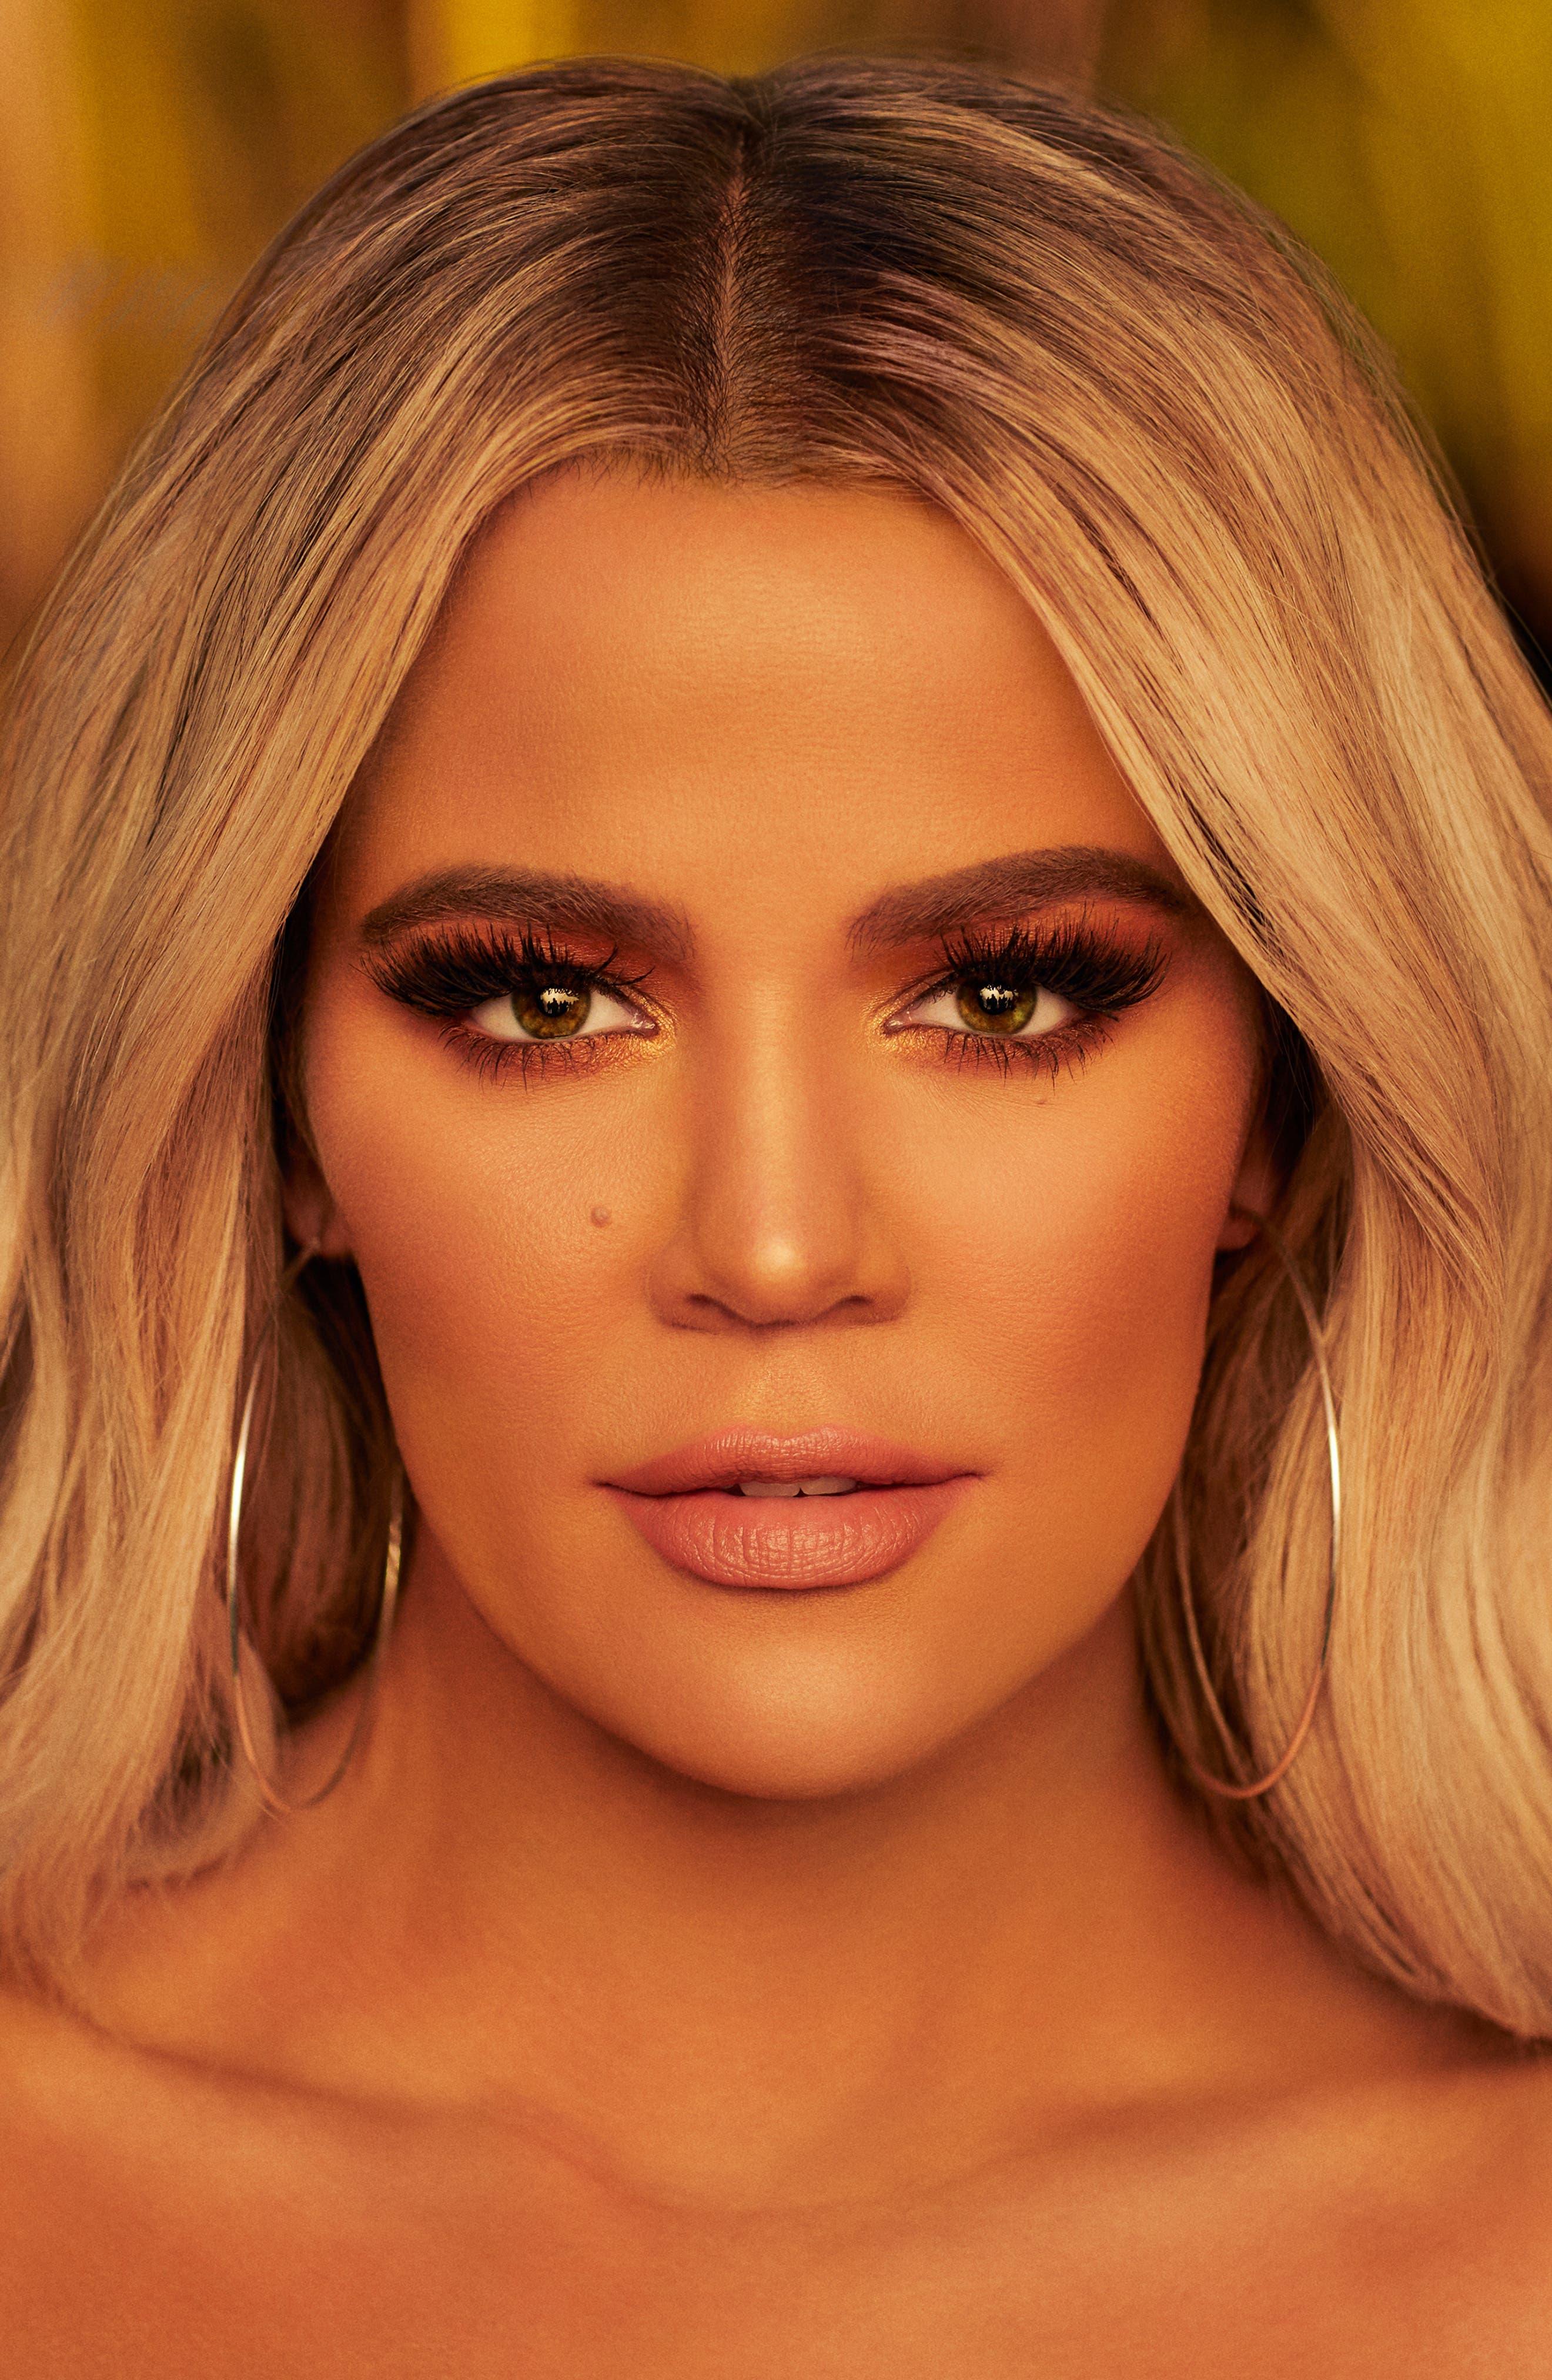 BECCA COSMETICS,                             BECCA x Khloé Kardashian & Malika Haqq Glow Letters,                             Alternate thumbnail 3, color,                             250